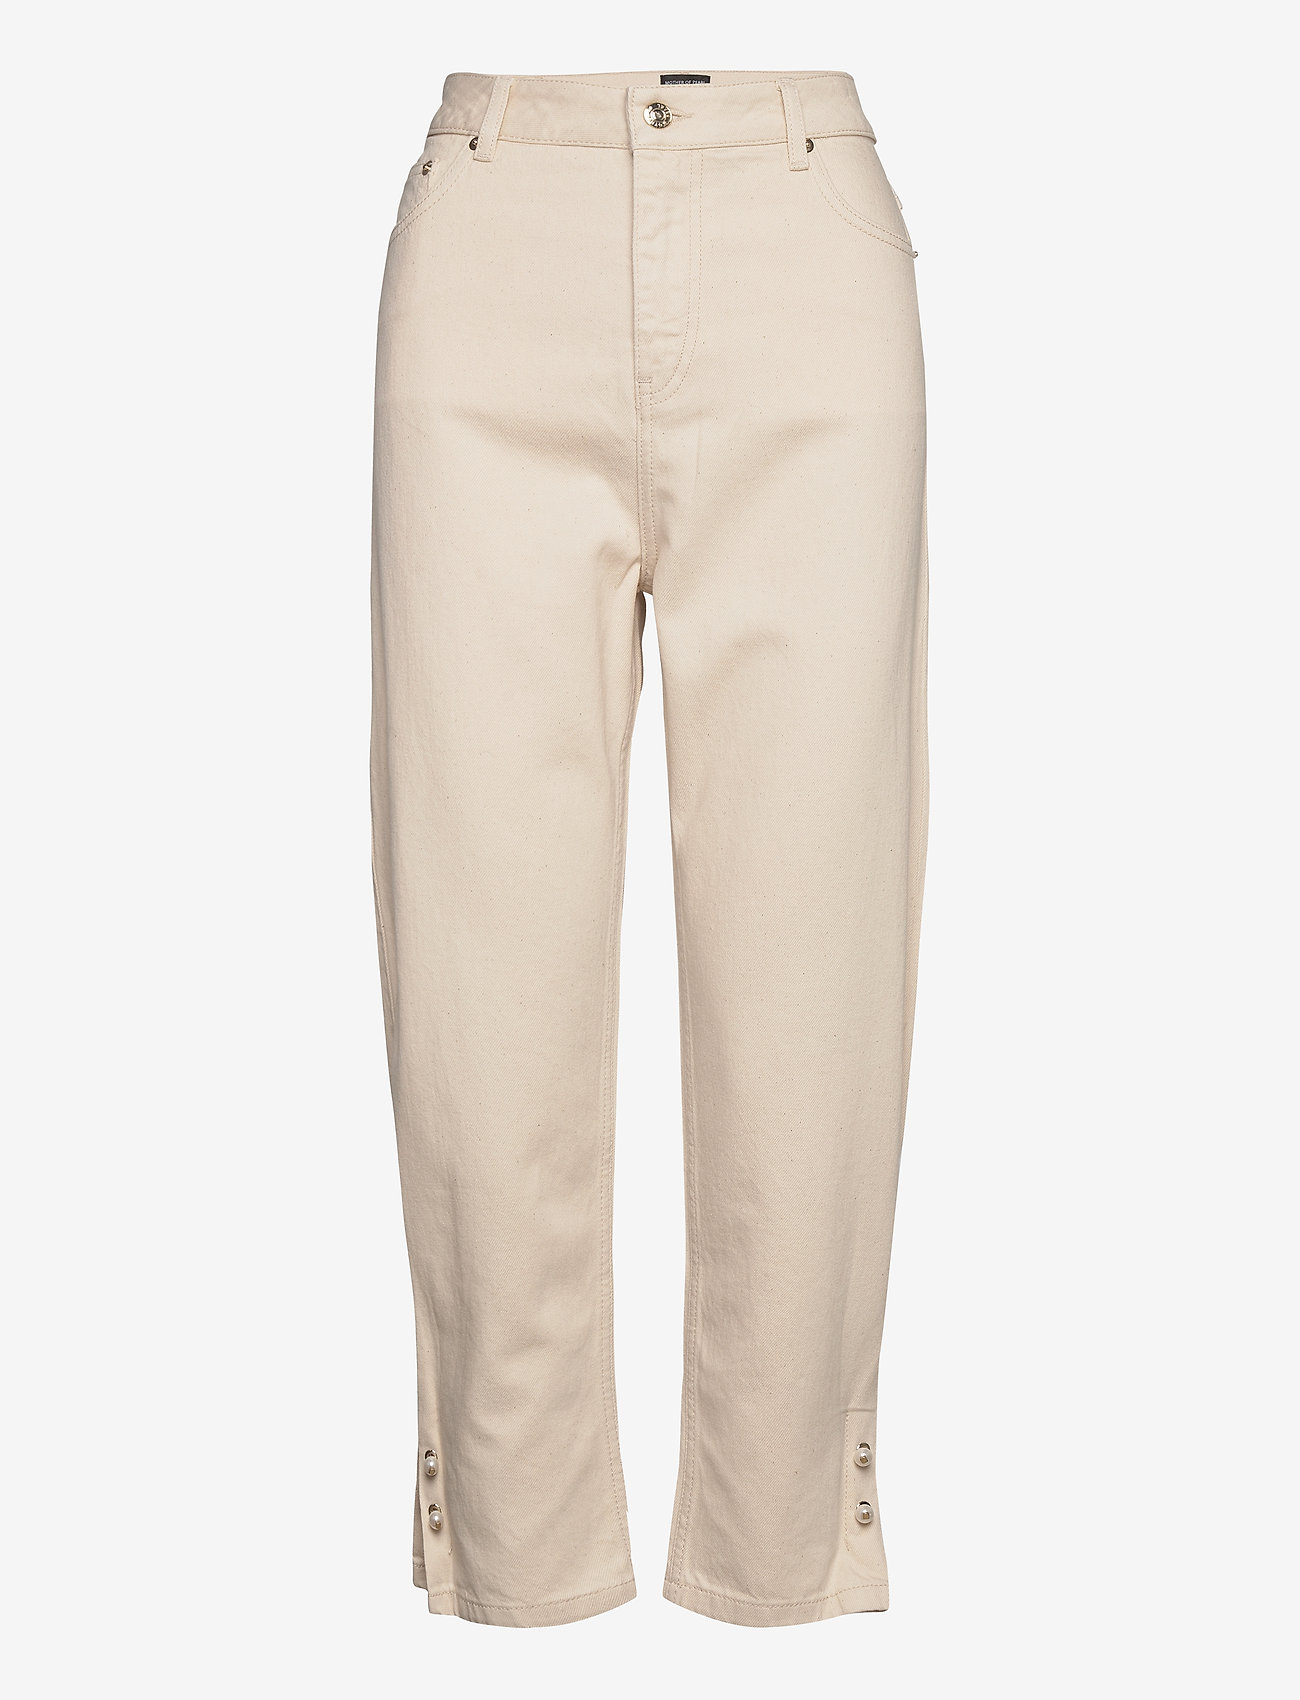 Mother of Pearl - KYRA ECRU DENIM JEANS WITH PEARL BAR CUFF - straight jeans - ecru - 0